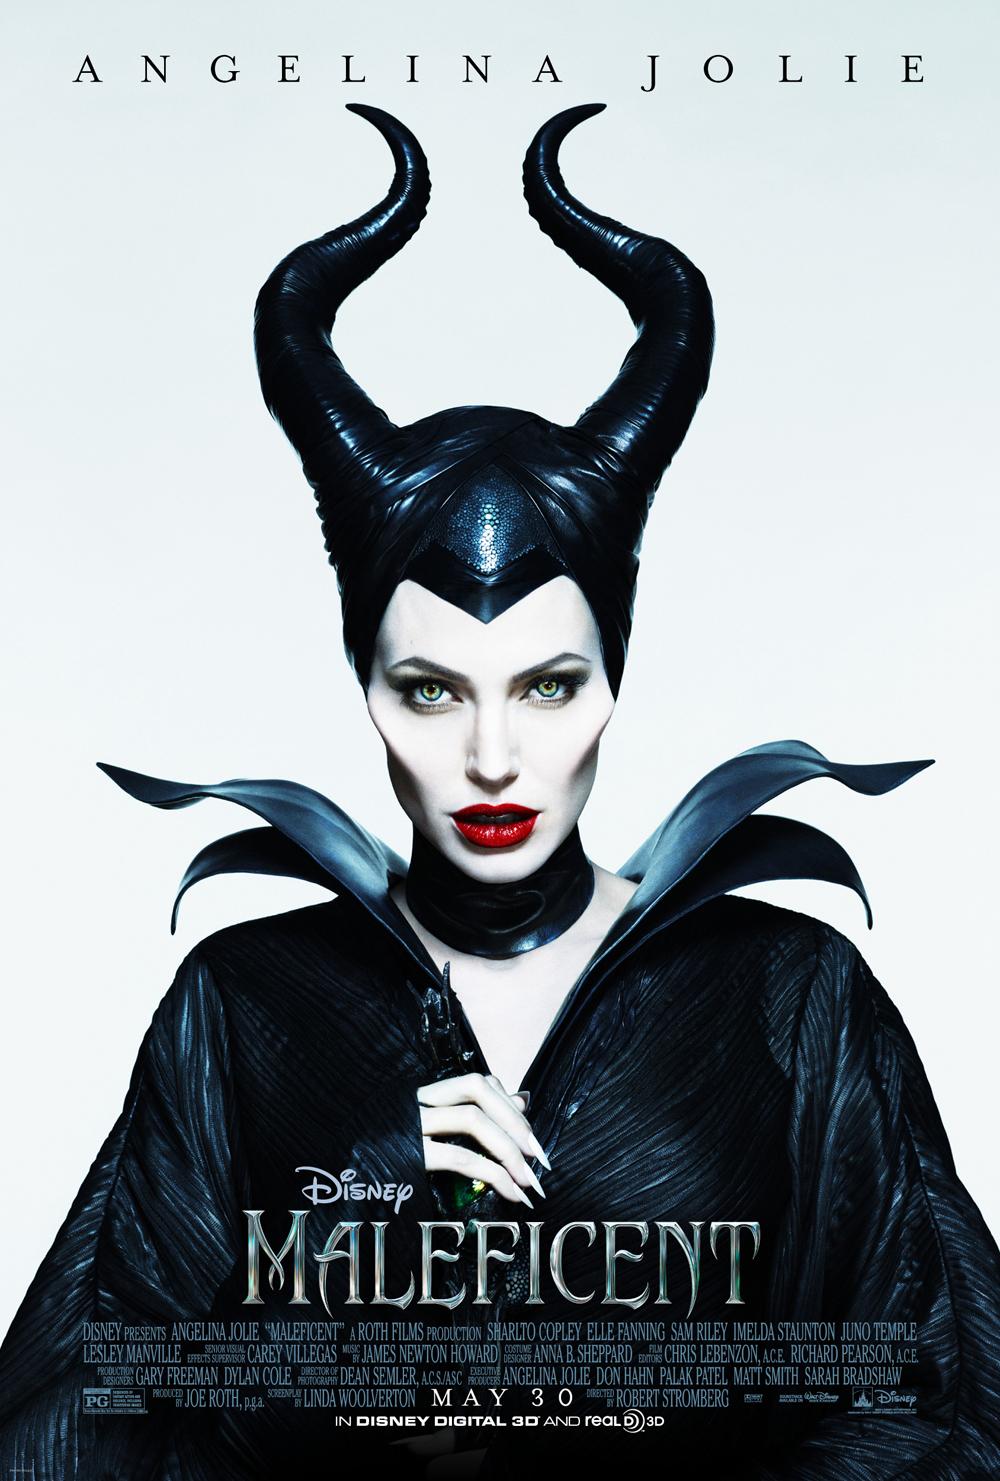 maleficent-poster-angelina-jolie